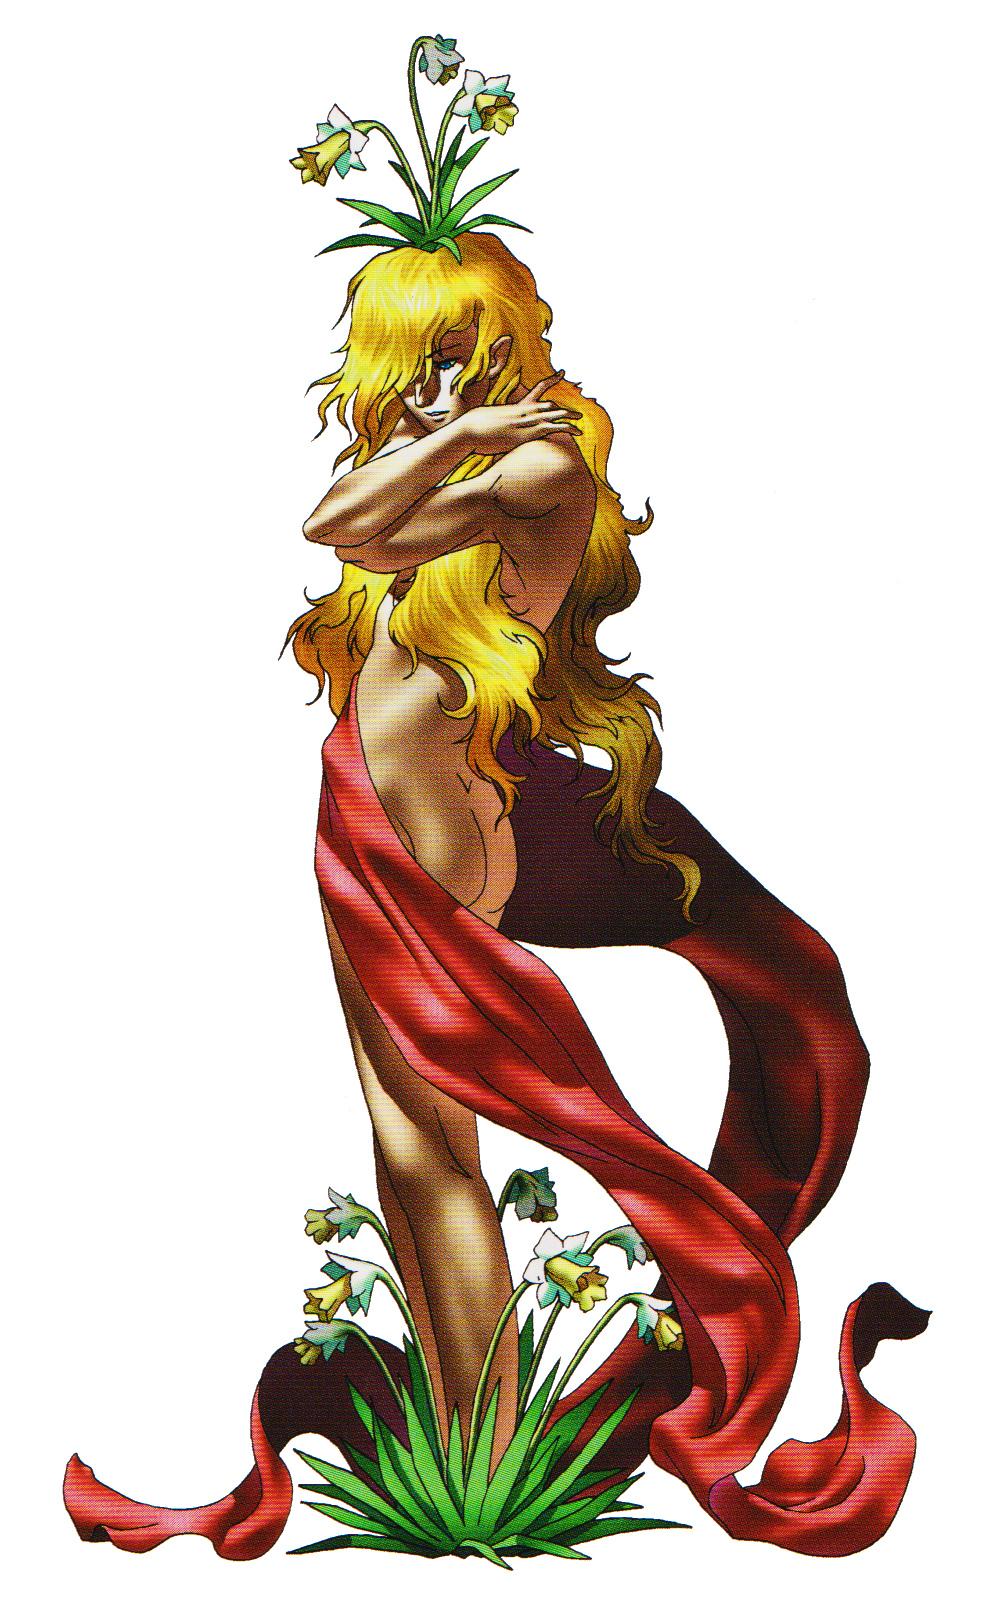 Narcissus | Megami Tensei Wiki | FANDOM powered by Wikia